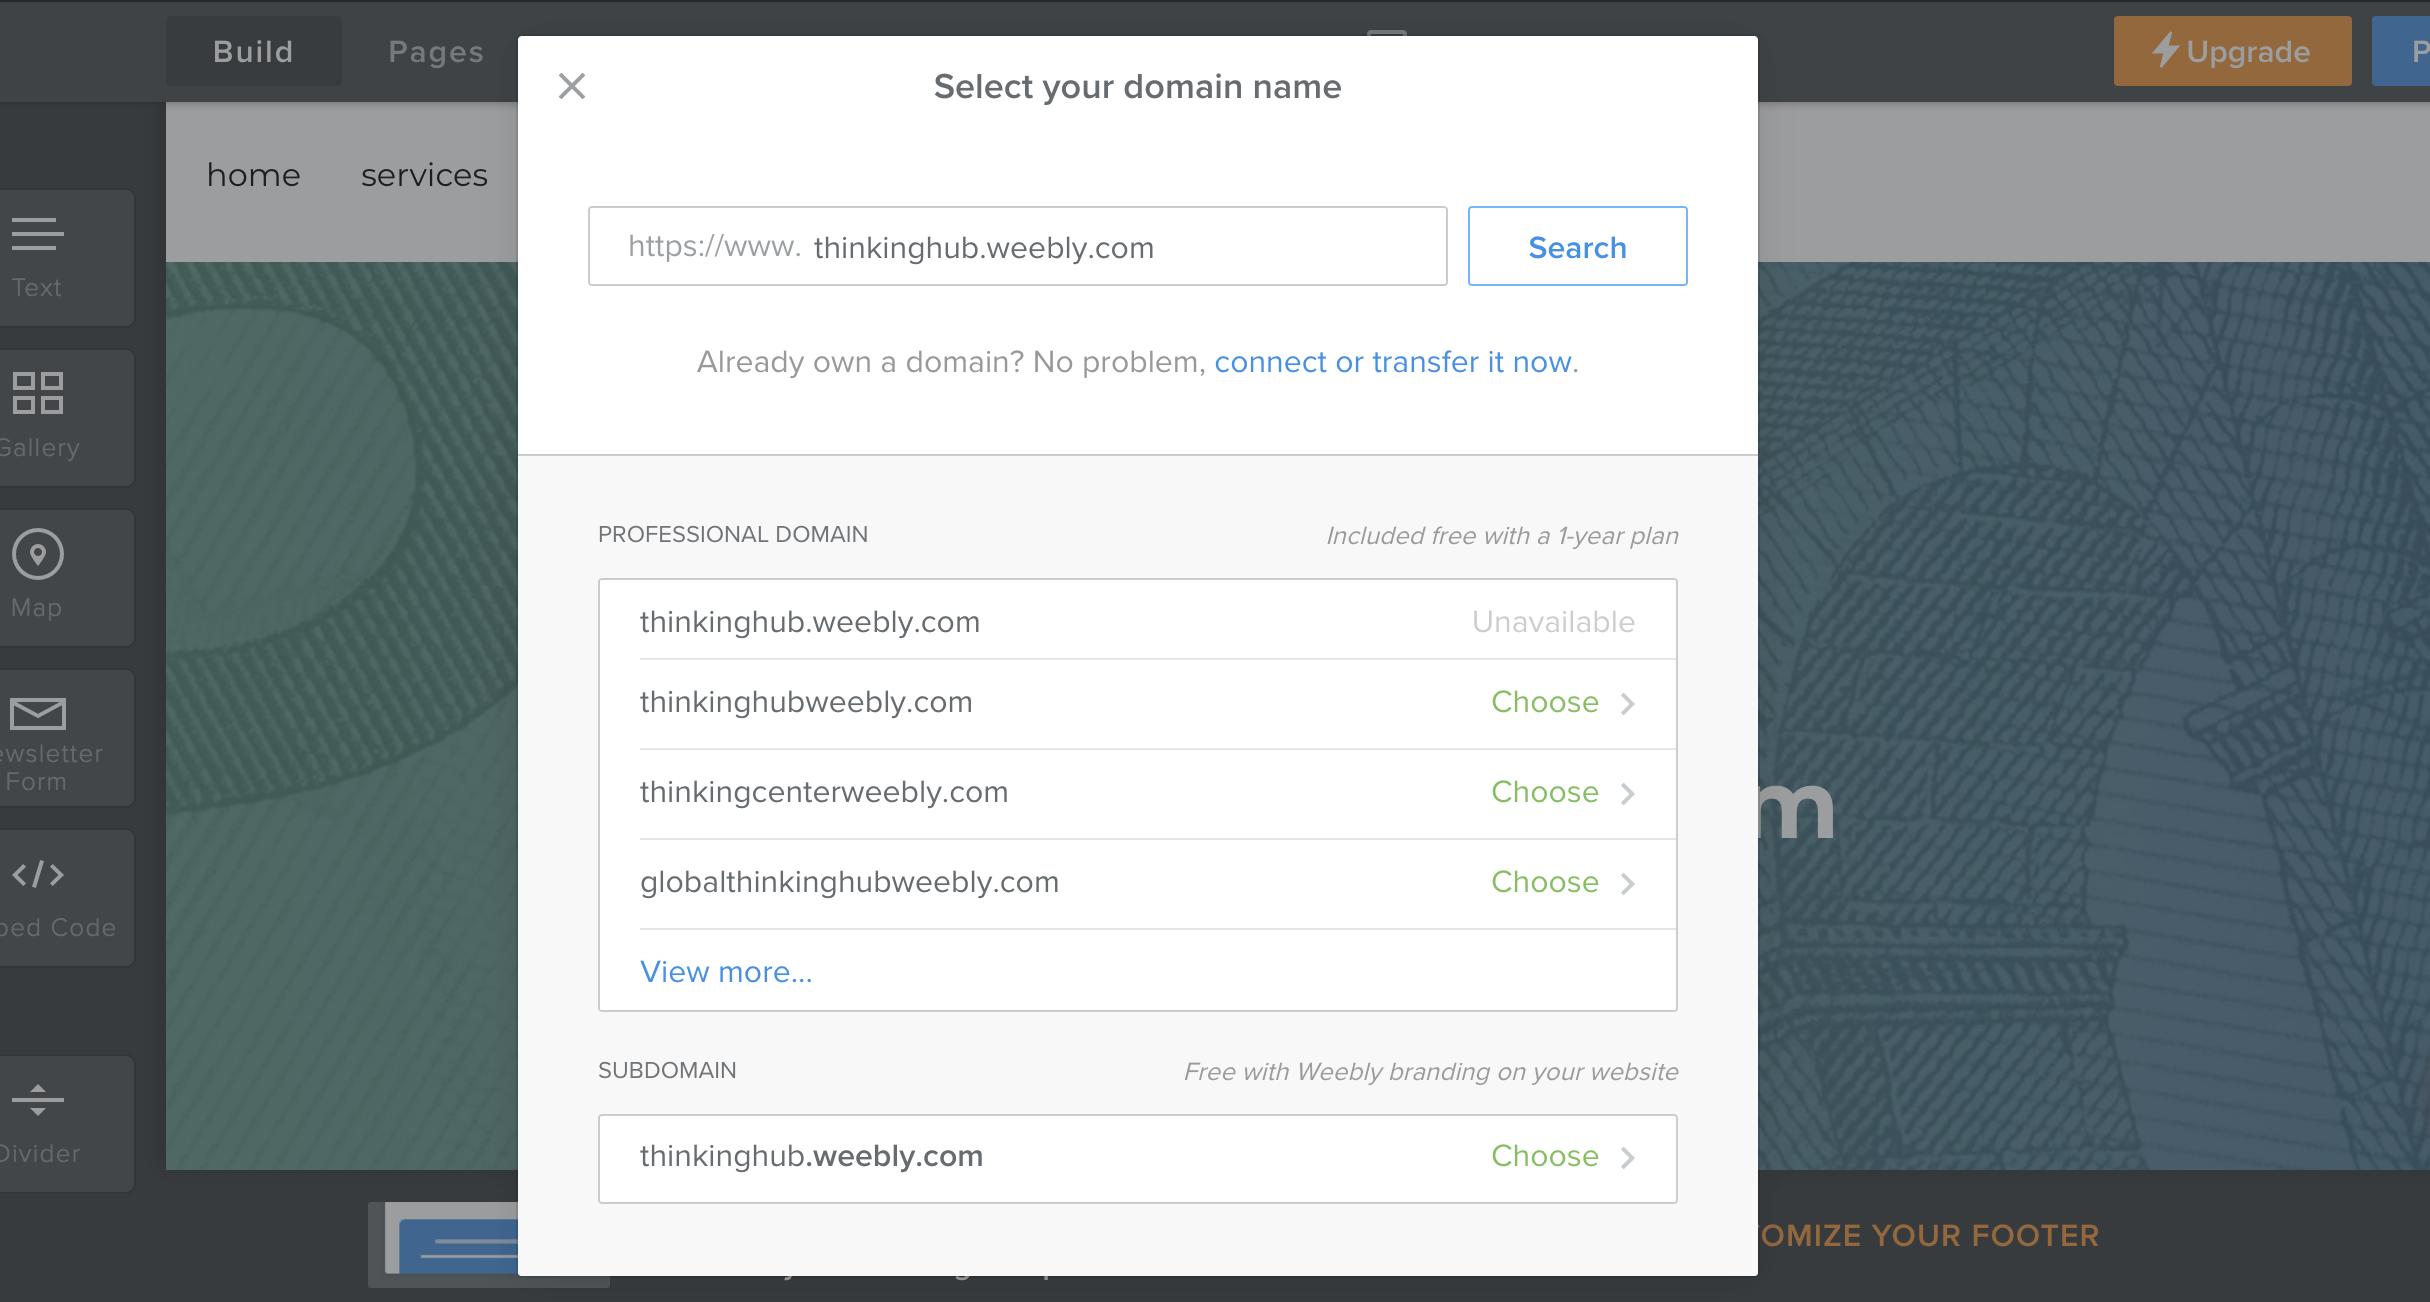 choosing domain options